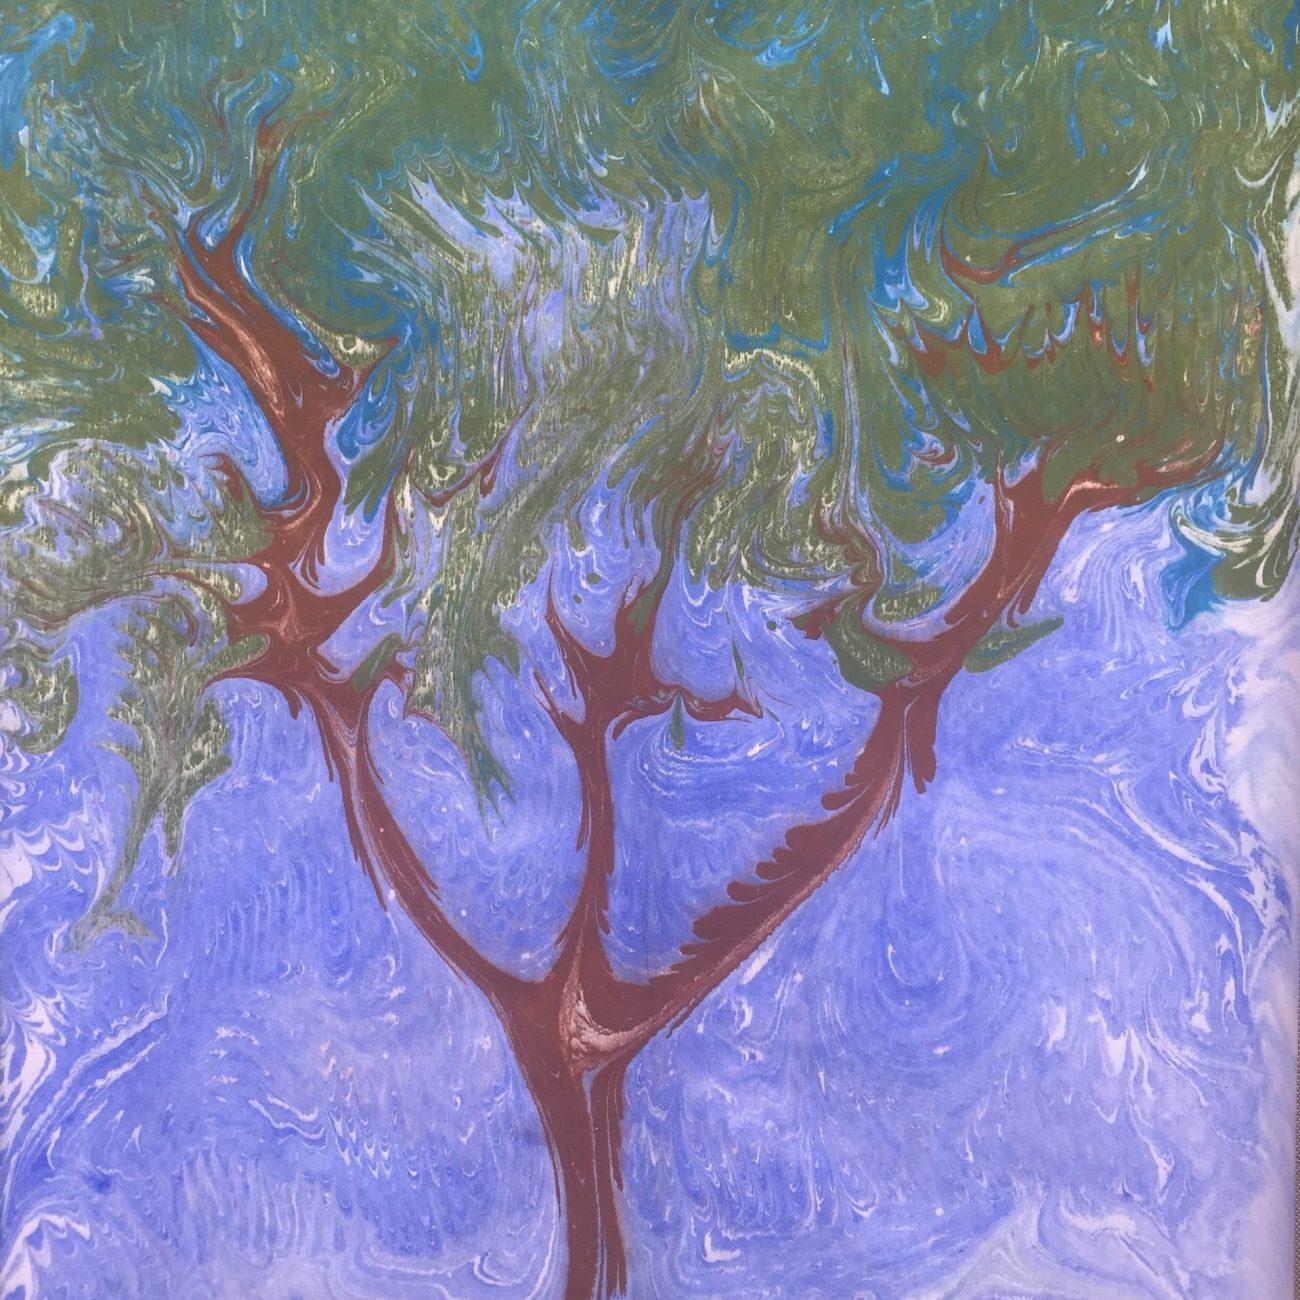 Tree- Teknik: Ebru Tekniği Ölçü: 35 x 50 cm Fiyat : 1.770 TL